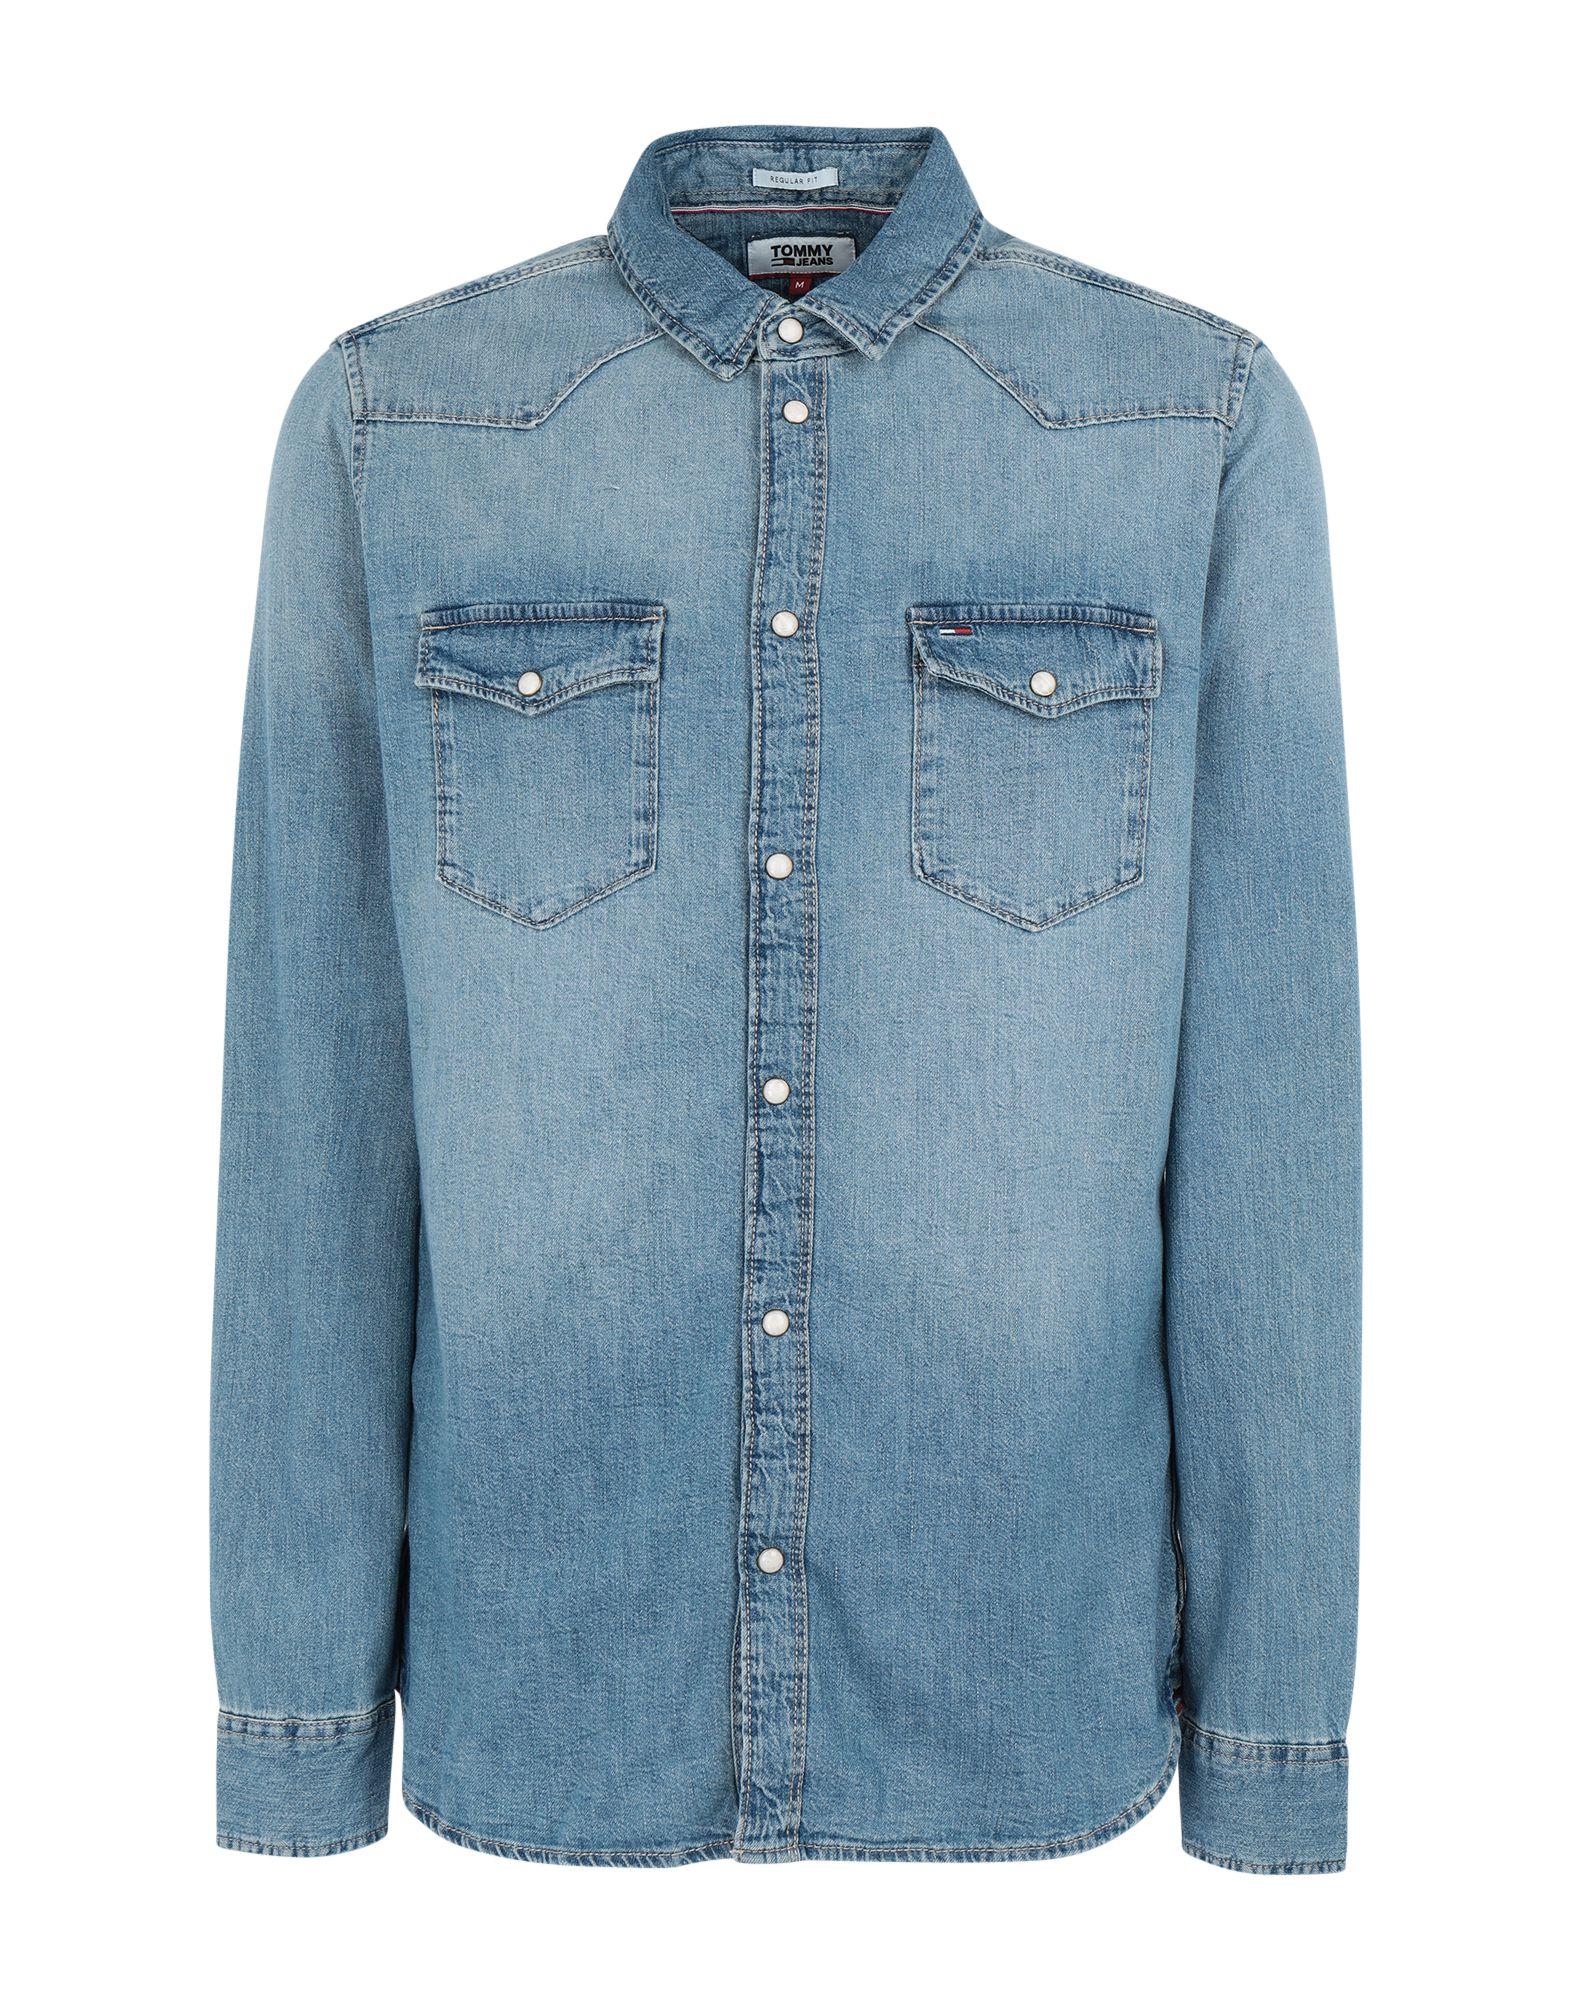 TOMMY JEANS Джинсовая рубашка tommy jeans джинсовая рубашка